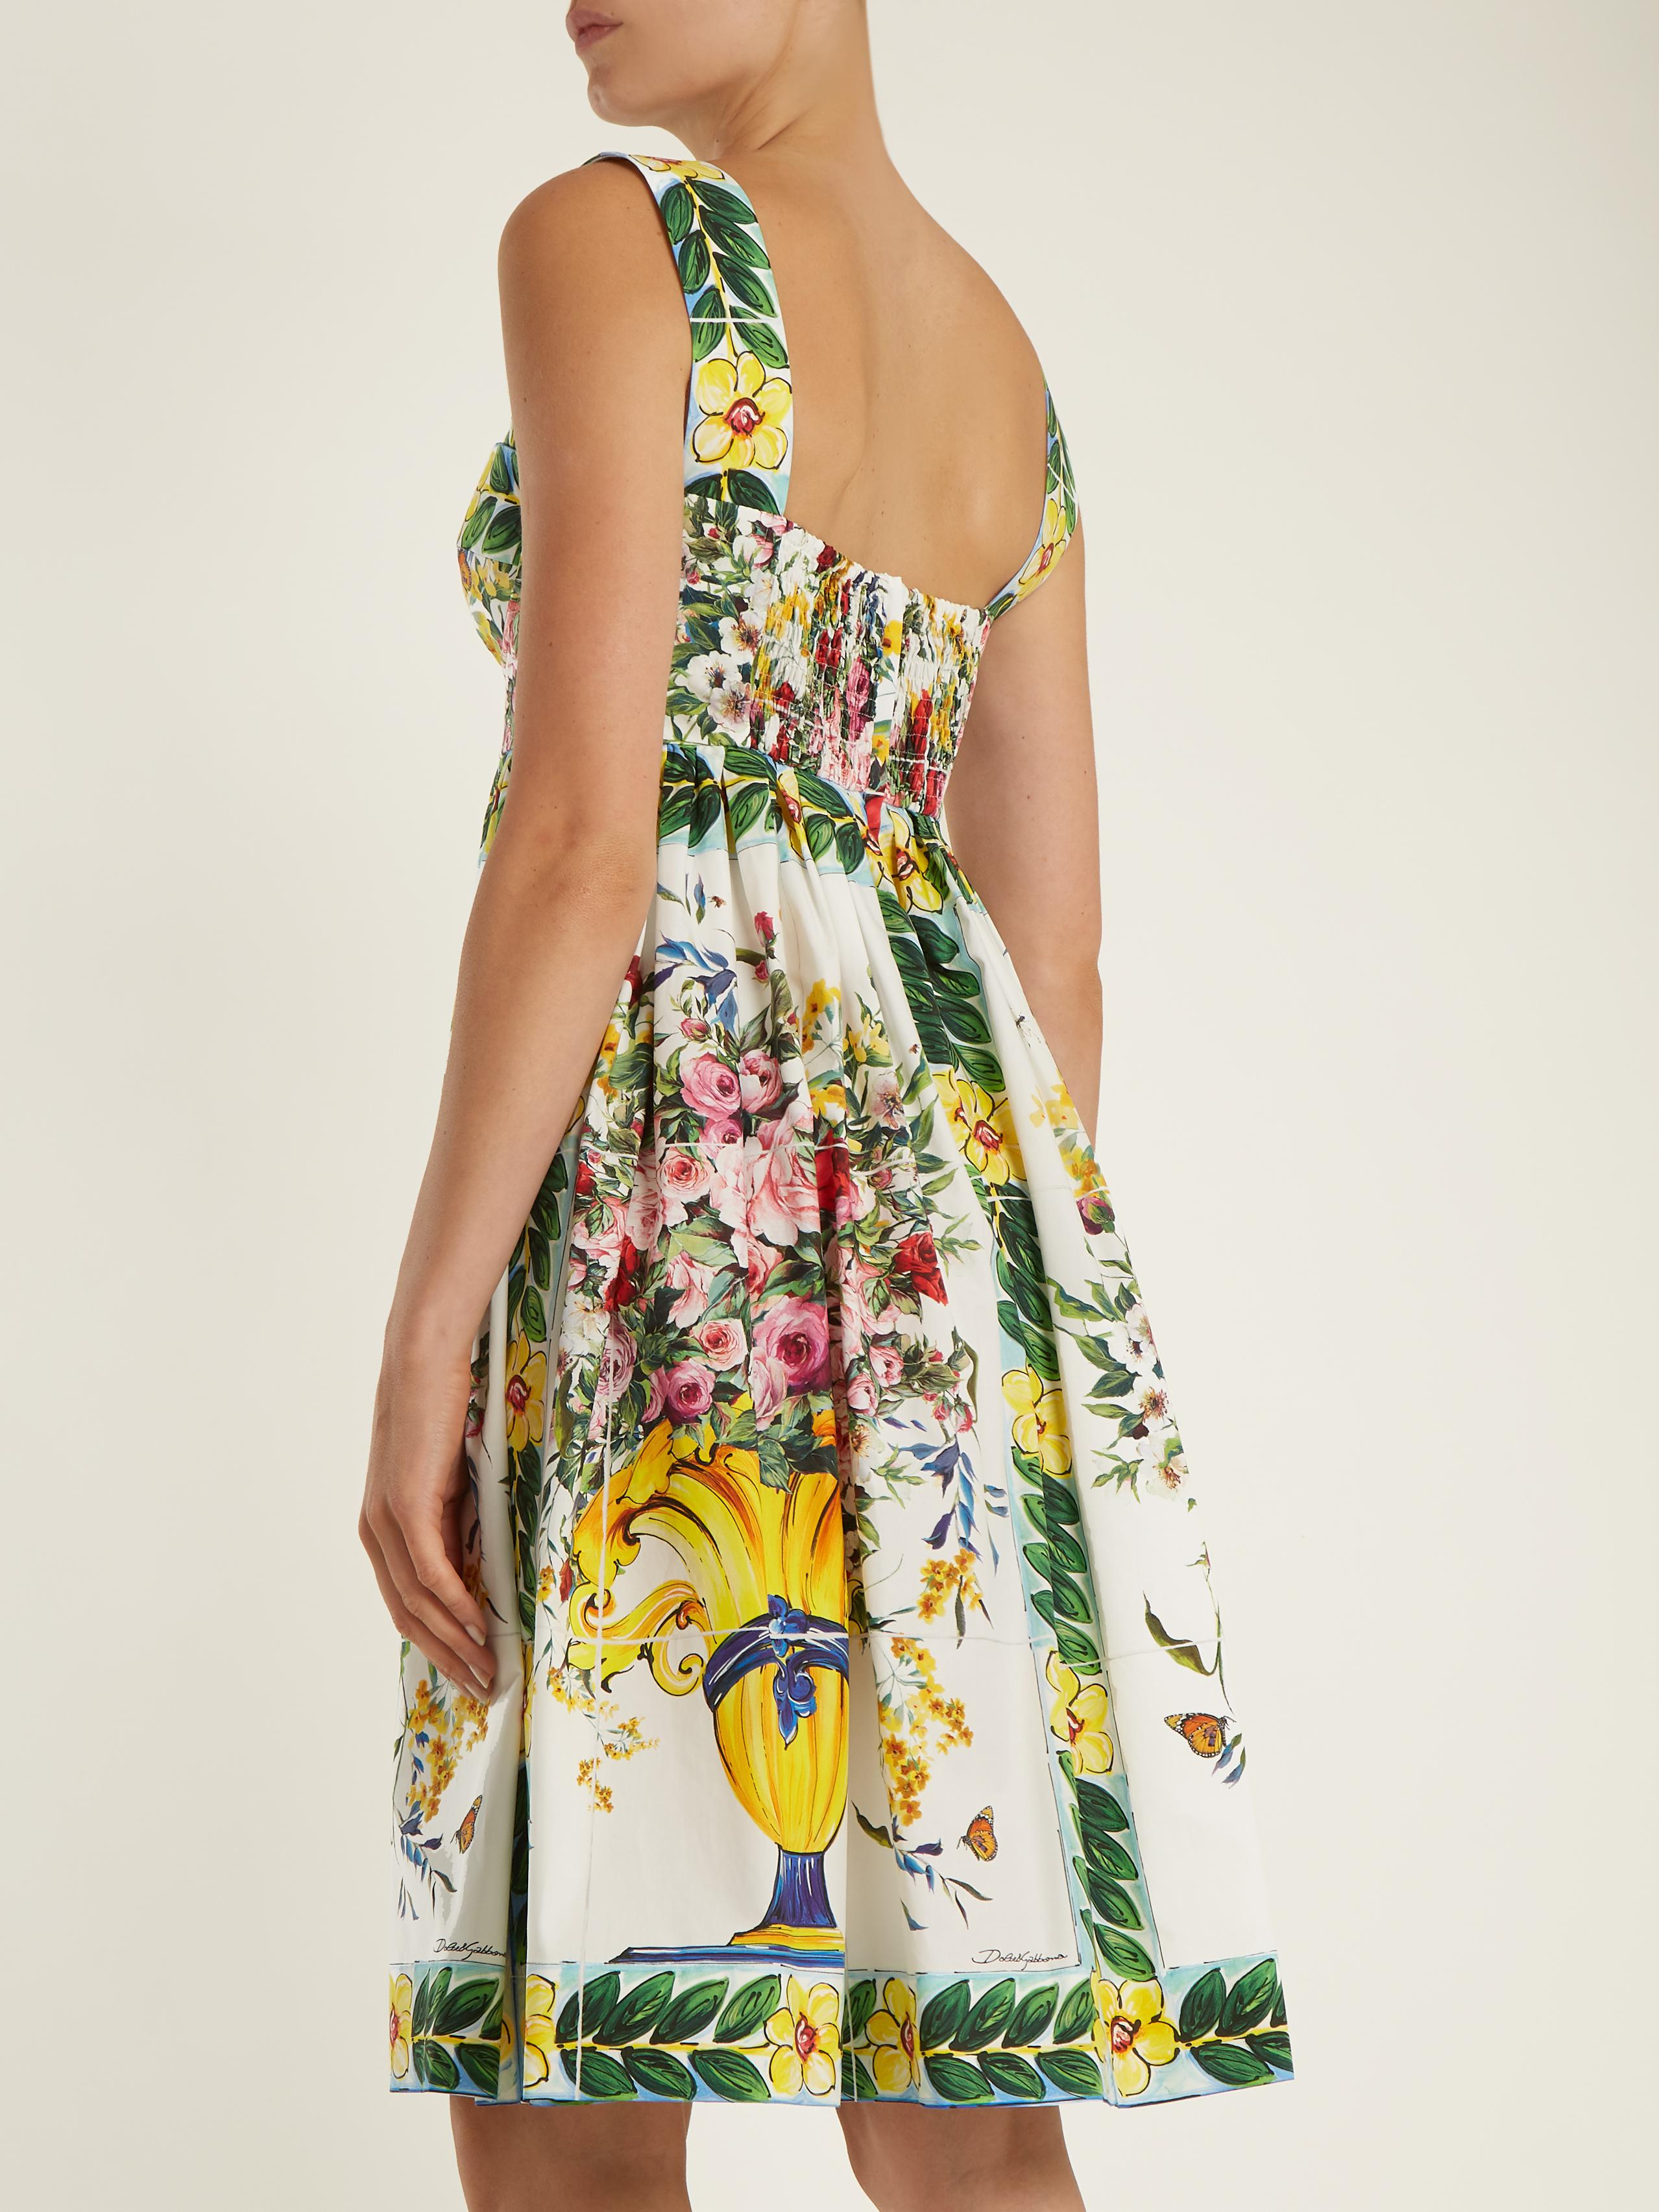 a73ea955 Dolce & Gabbana Floral-print Gathered-skirt Cotton-poplin Dress in ...